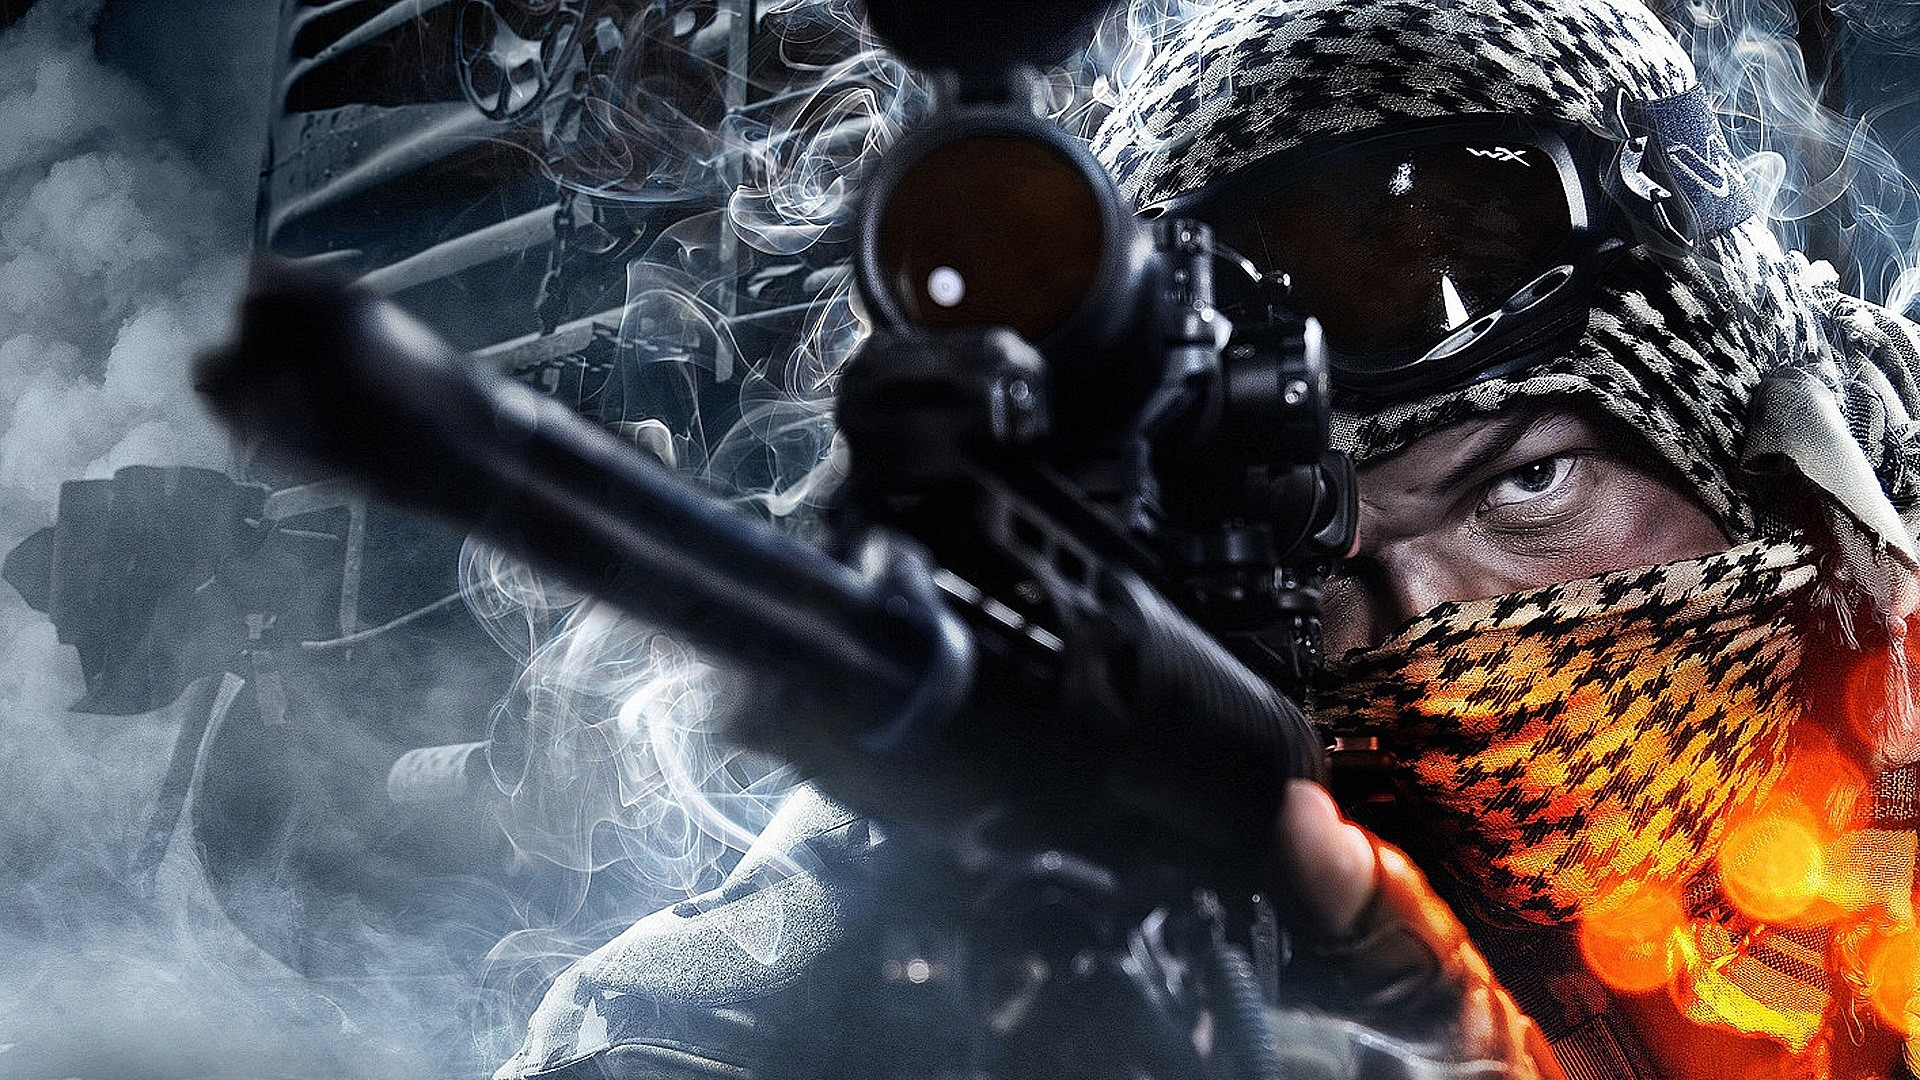 Battlefield 4 HD Wallpapers – Battlefield – PS3 Games wallpapers – HD – #3